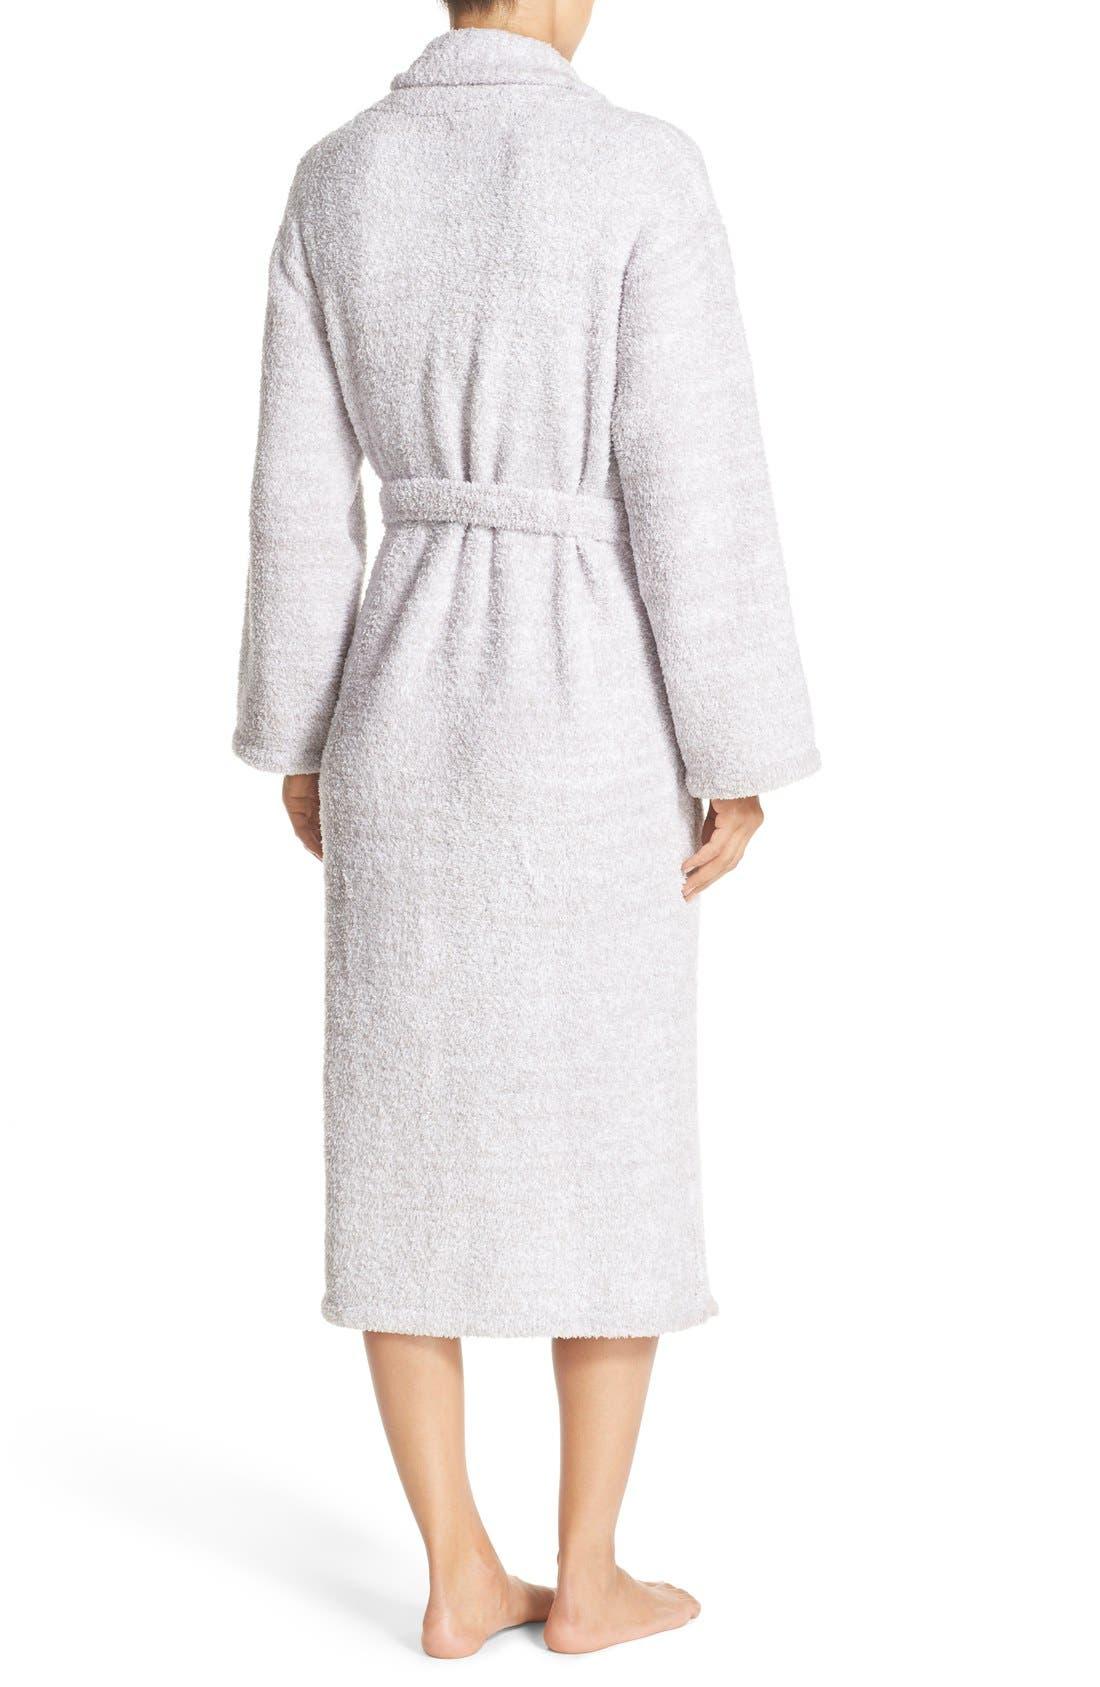 pieces set raglan com sleeve pajamas pajama fashionmia two products comforter comfortable